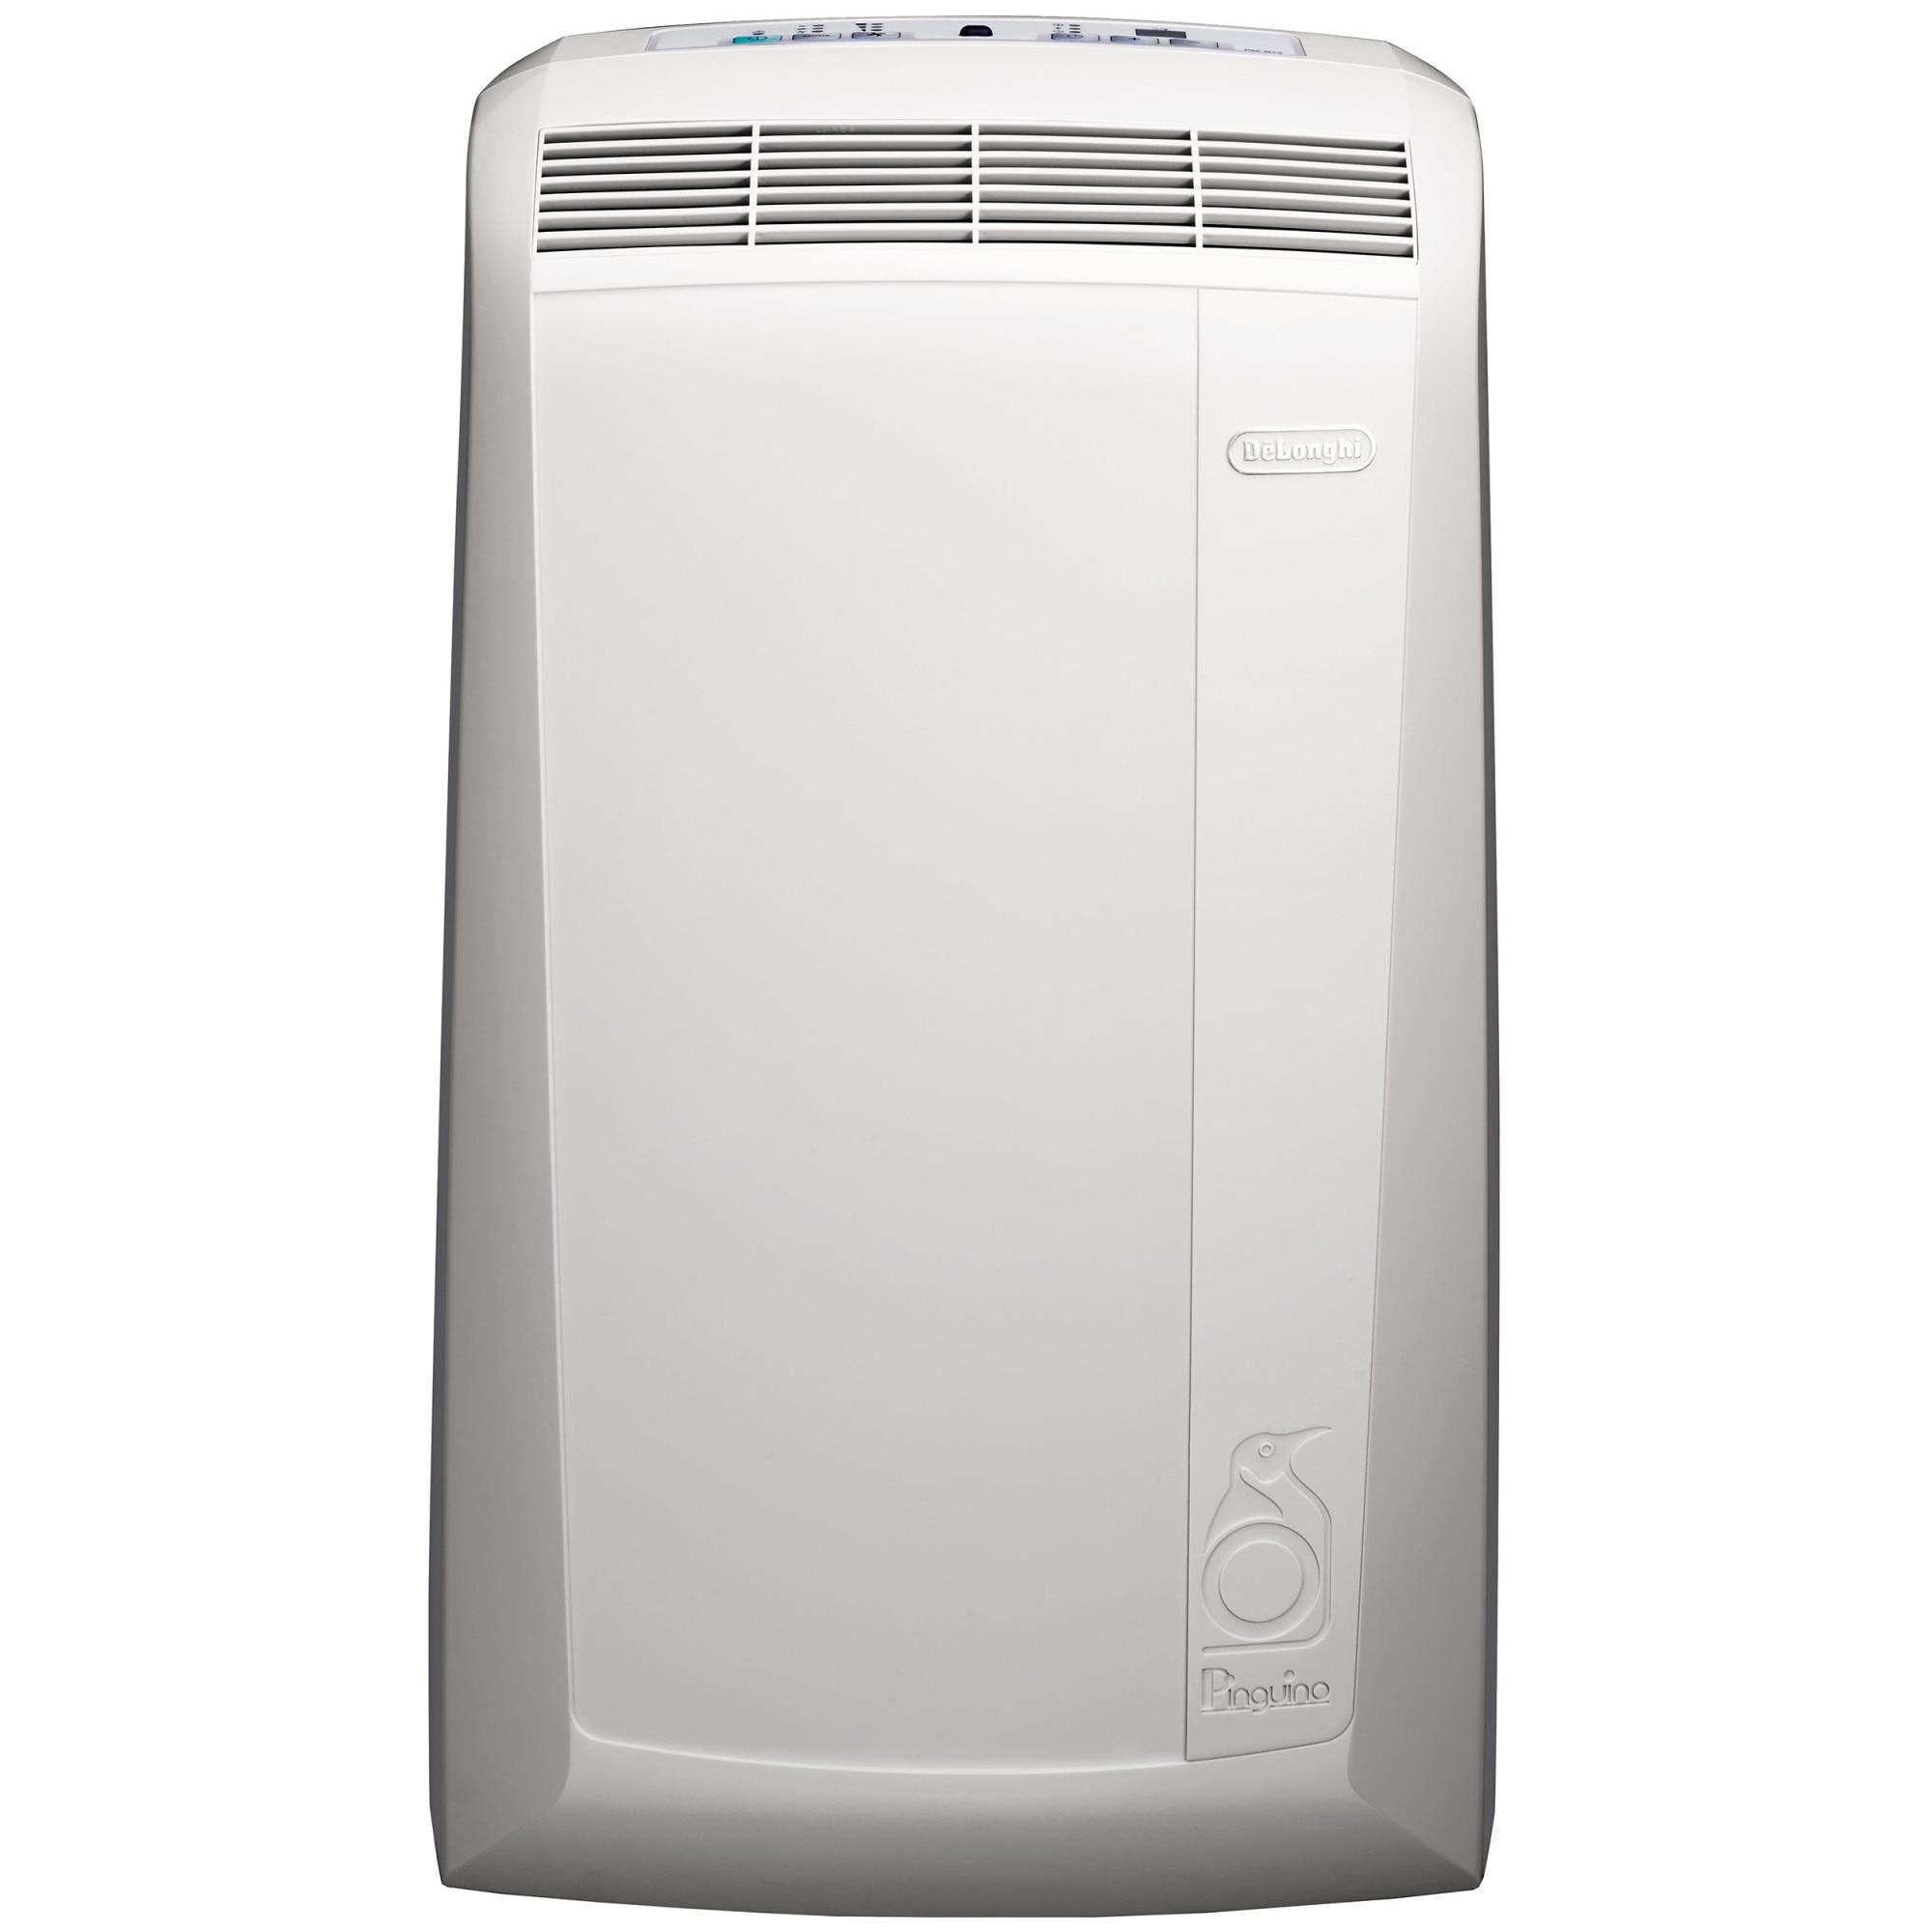 Fotografie Aparat de aer conditionat portabil De'Longhi 9800 BTU, Clasa A, dezumidificare, functie ventilare, timer, control digital, PAC N90 ECOSILENT, Alb